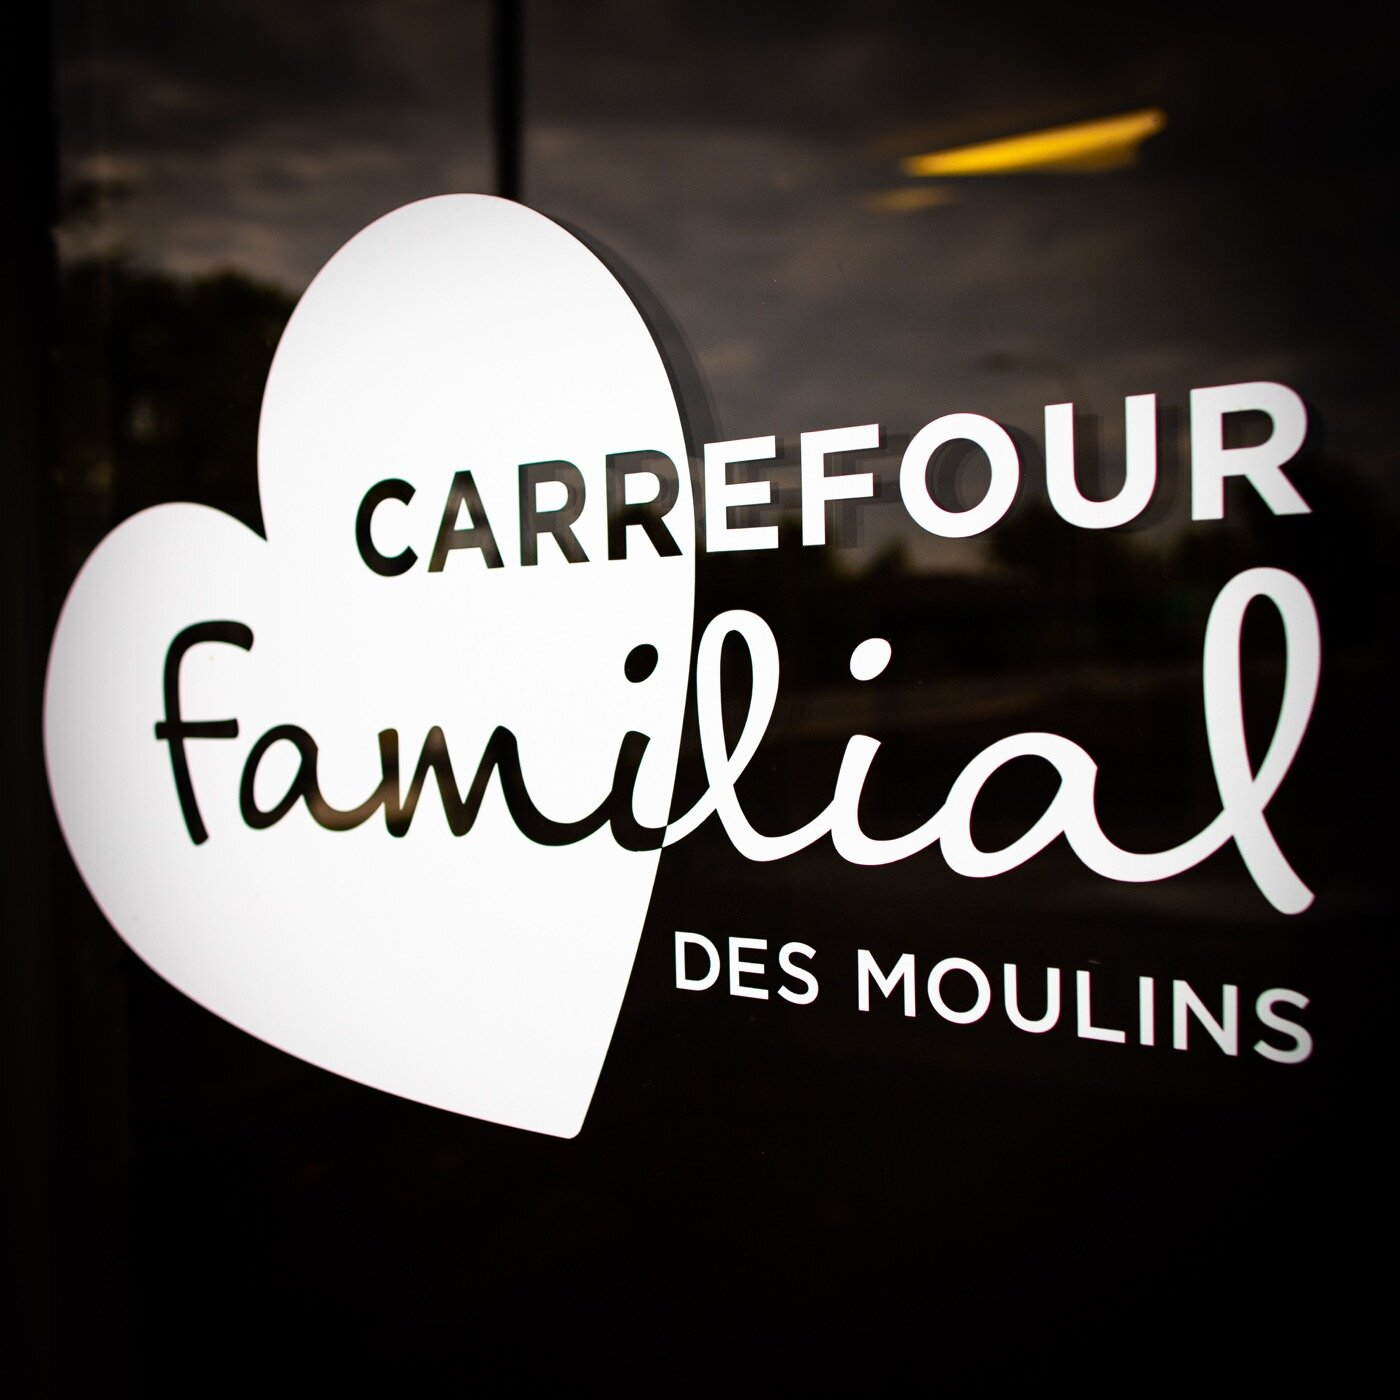 carrefour-familial-olivier-lamarre-design-graphiste-1.jpg